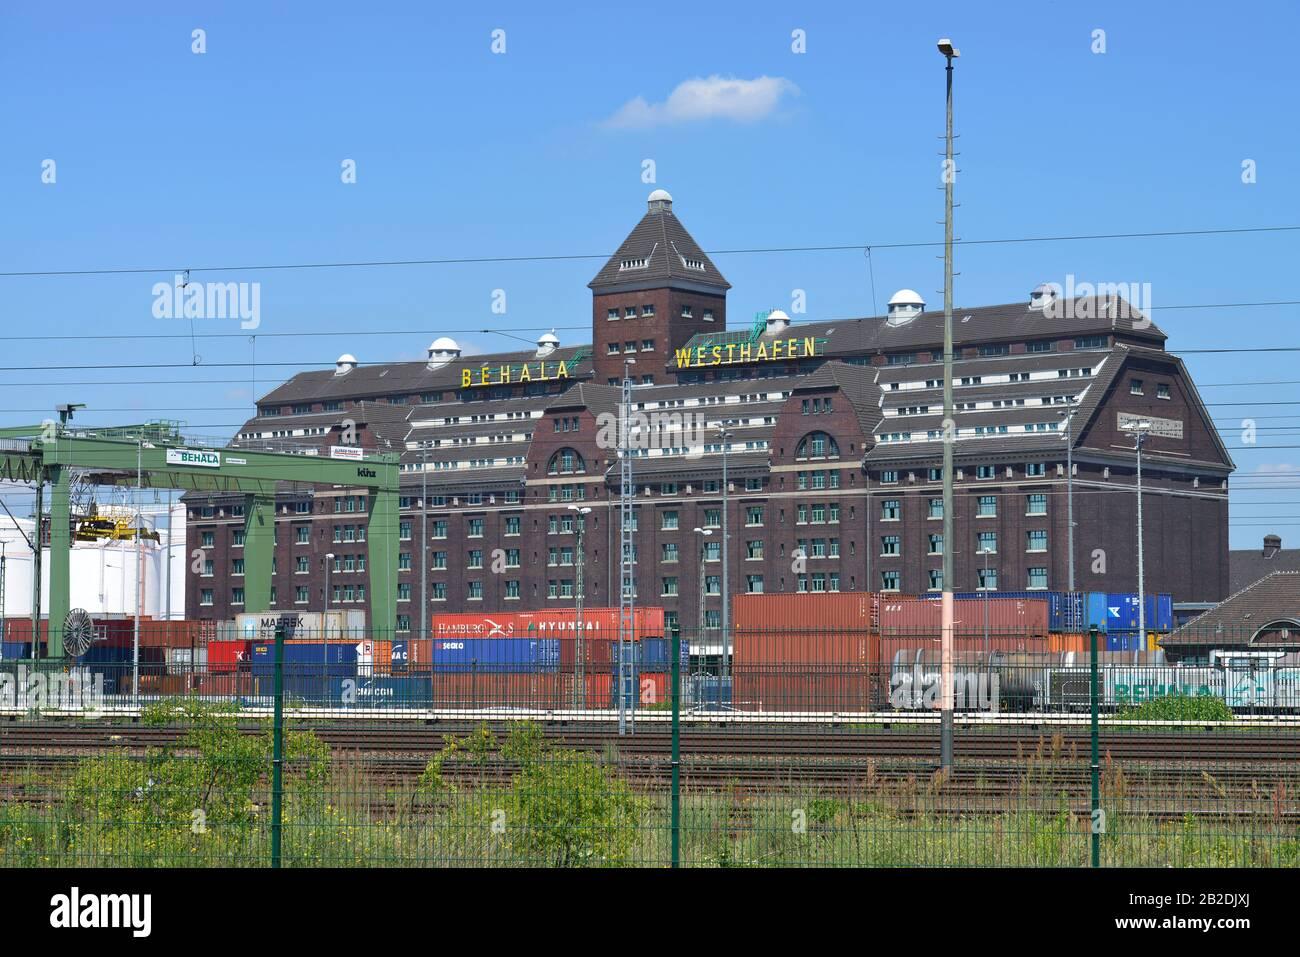 Lagerhaus, Behala, Westhafen, Moabit, Berlin, Deutschland Stock Photo